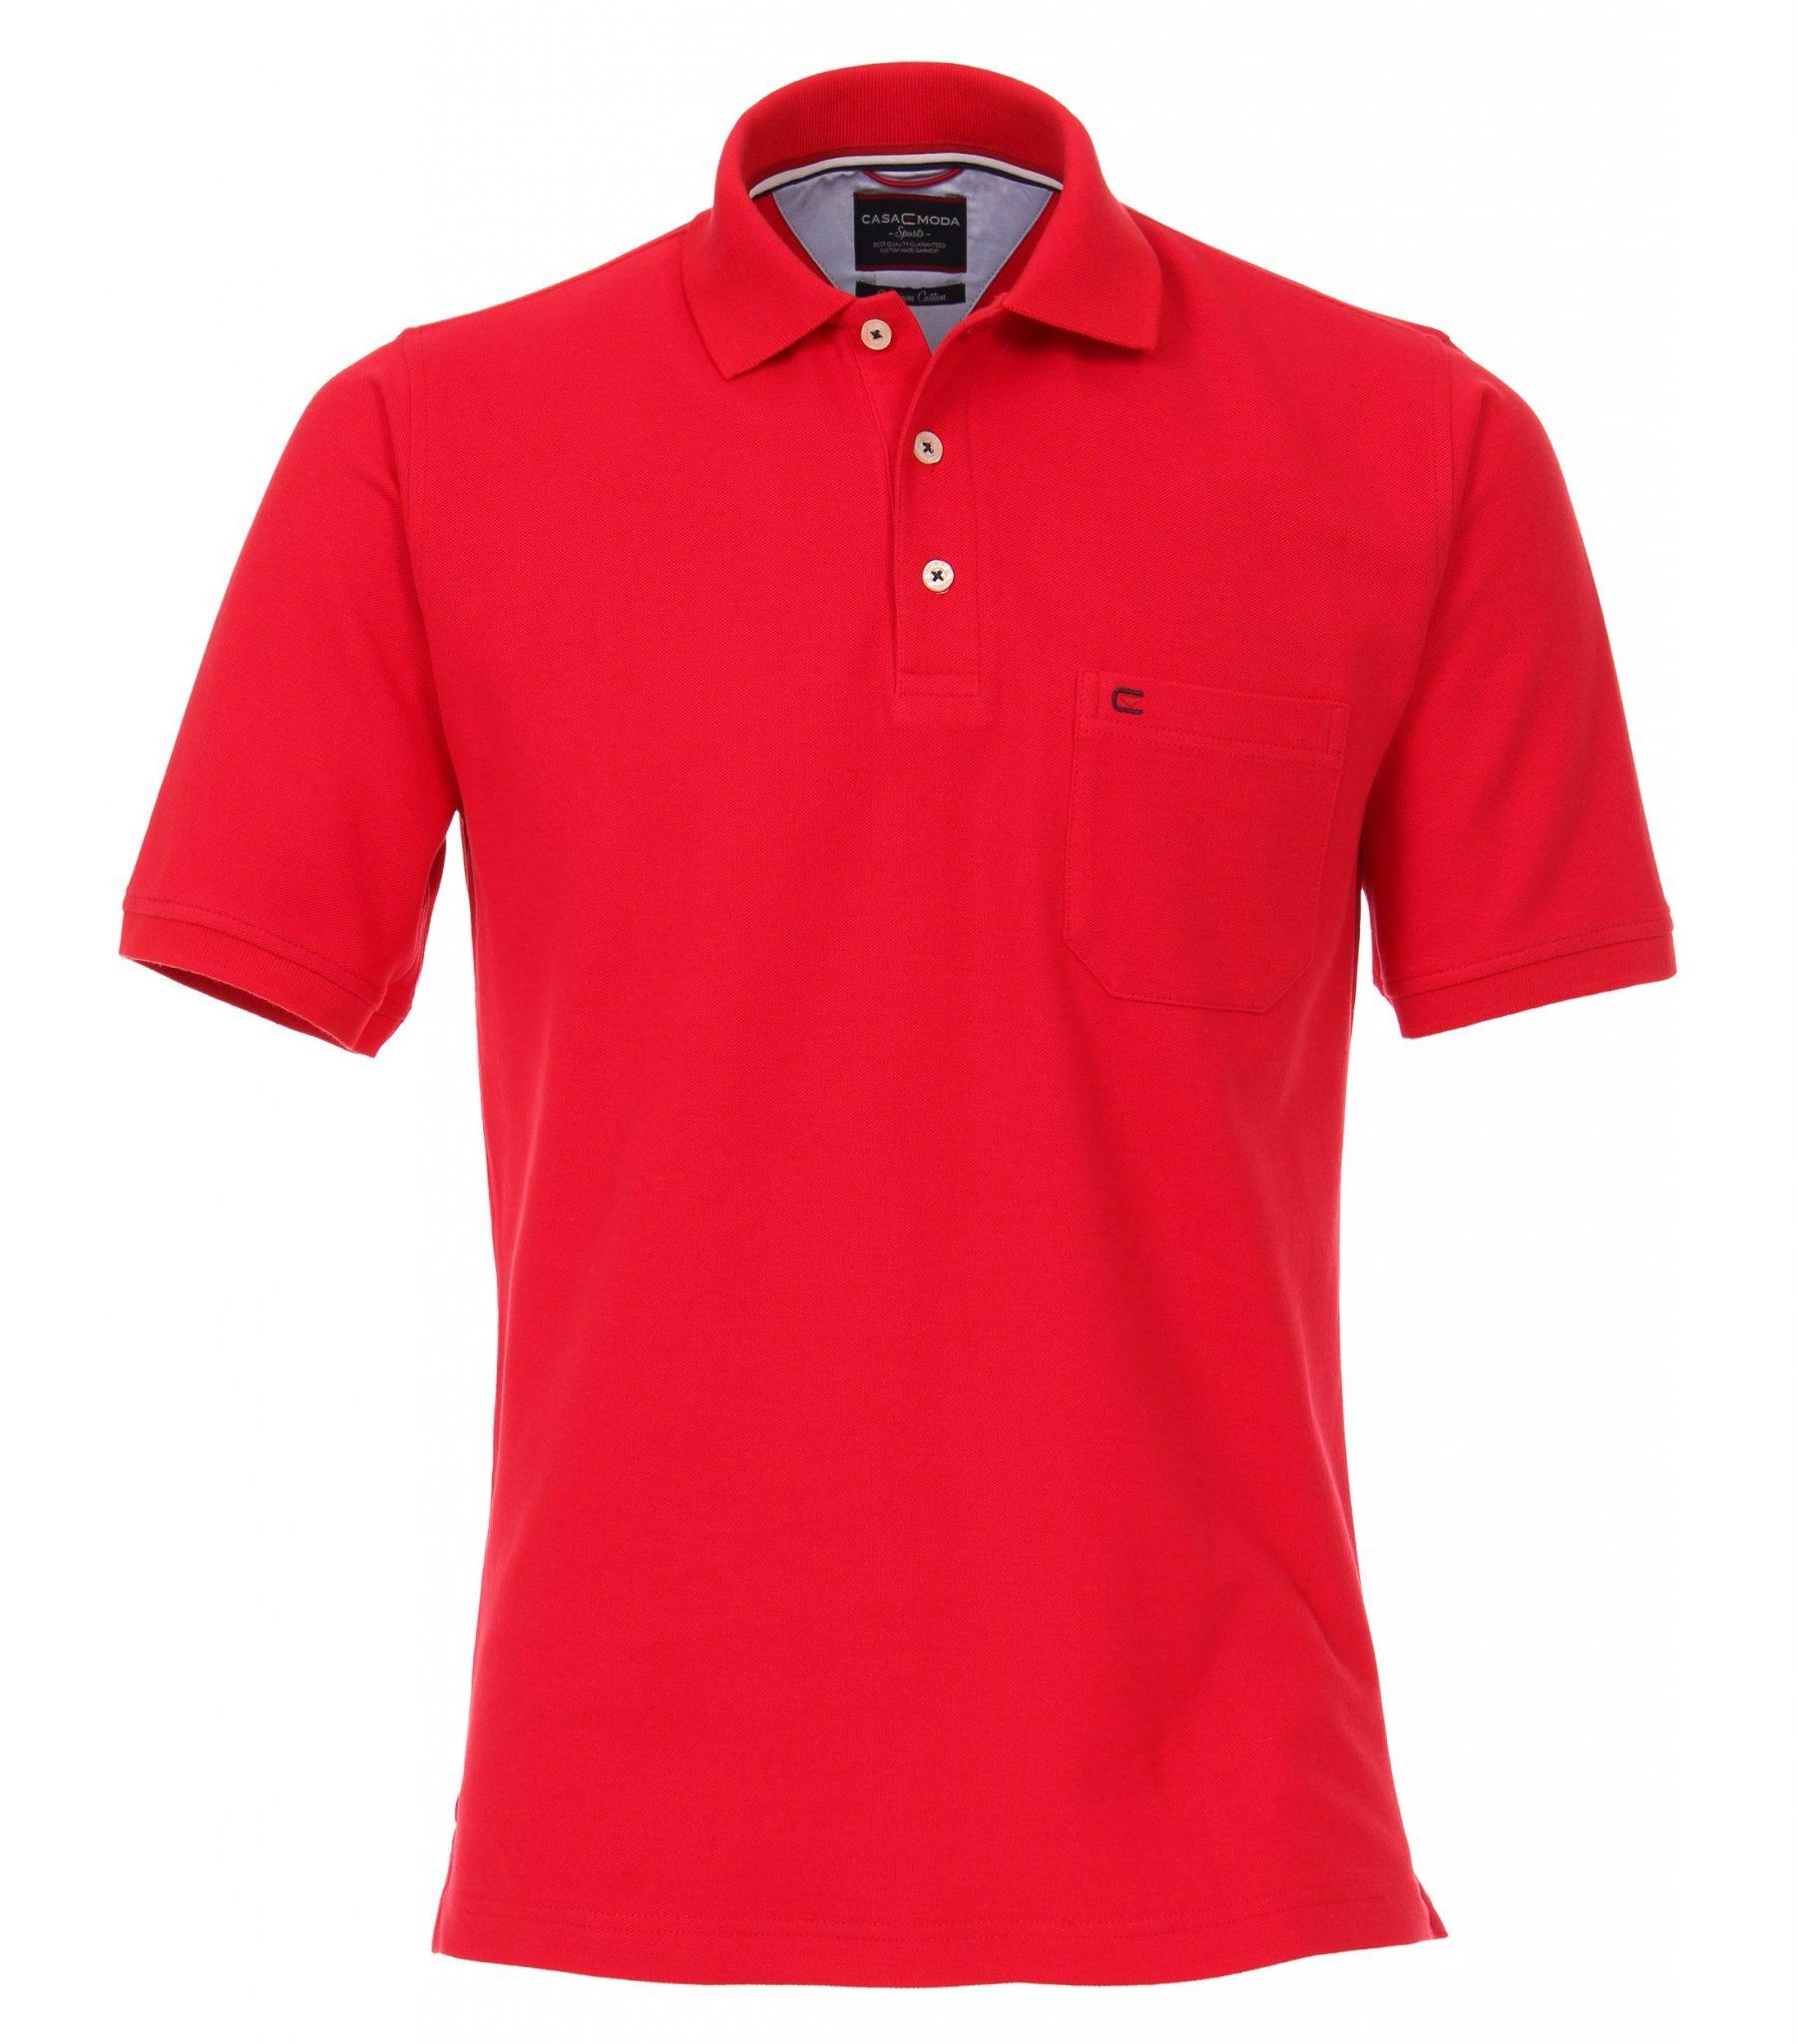 Casa Moda grote maat poloshirt uni rood met borstzakje